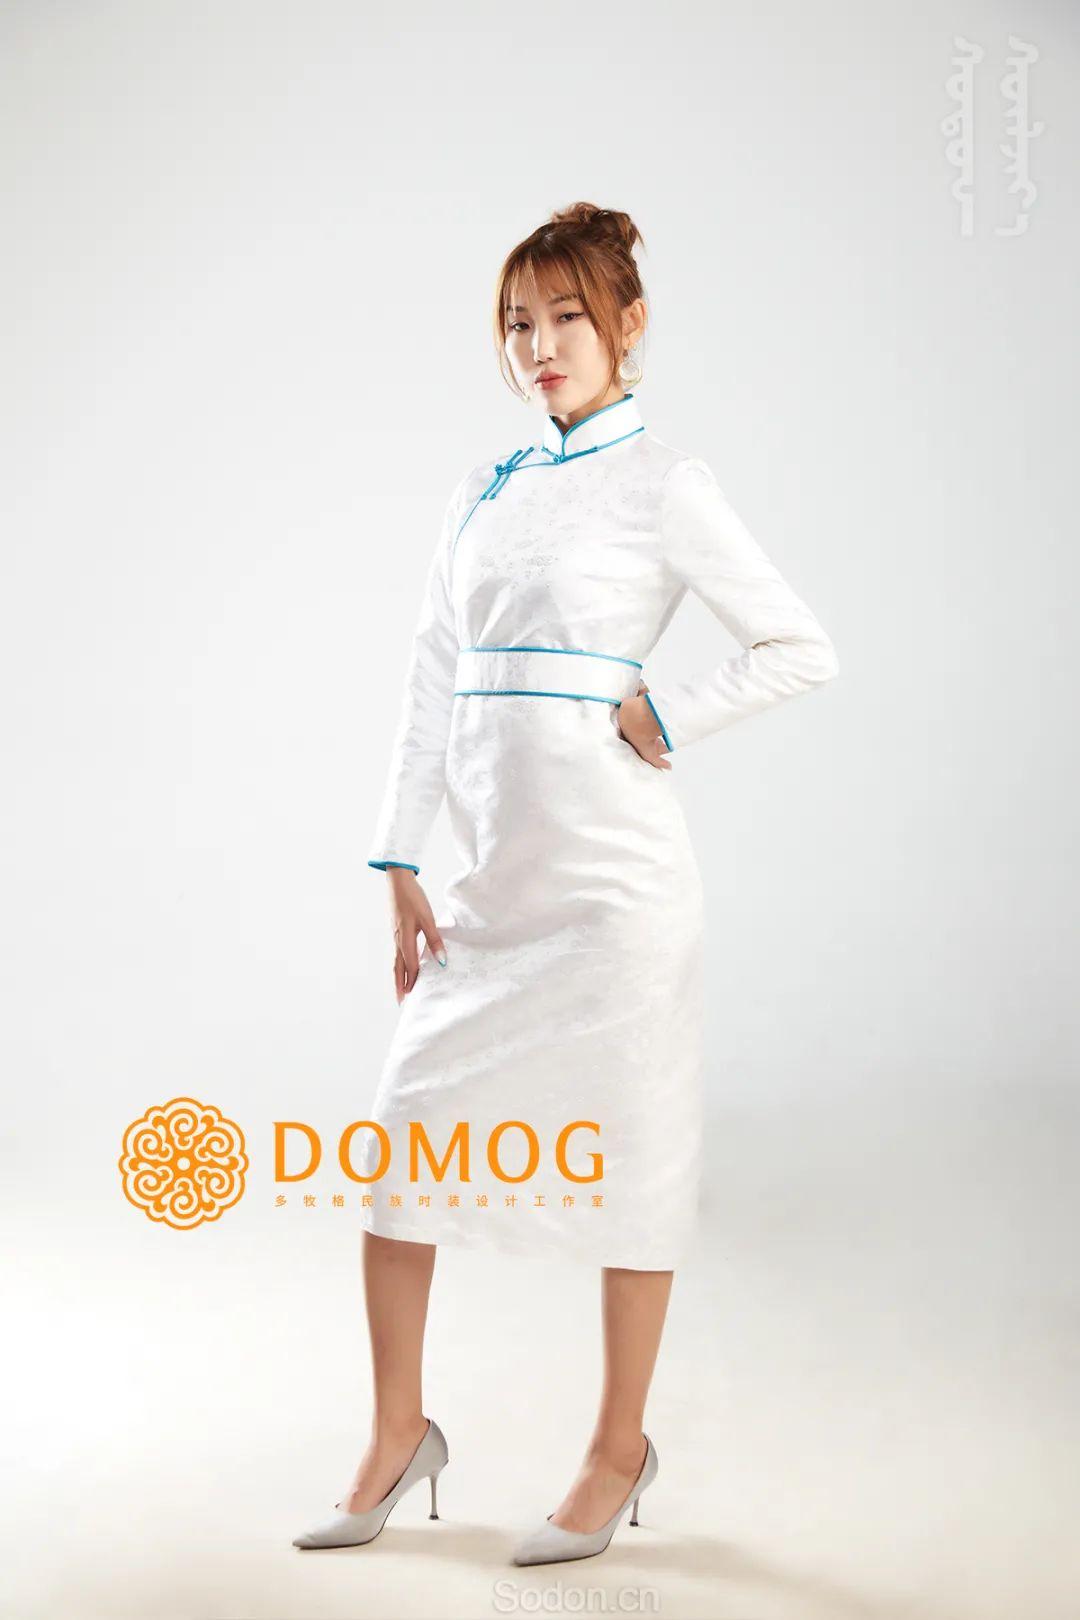 DOMOG 蒙古时装2020新款,民族与时尚的融合 第23张 DOMOG 蒙古时装2020新款,民族与时尚的融合 蒙古服饰